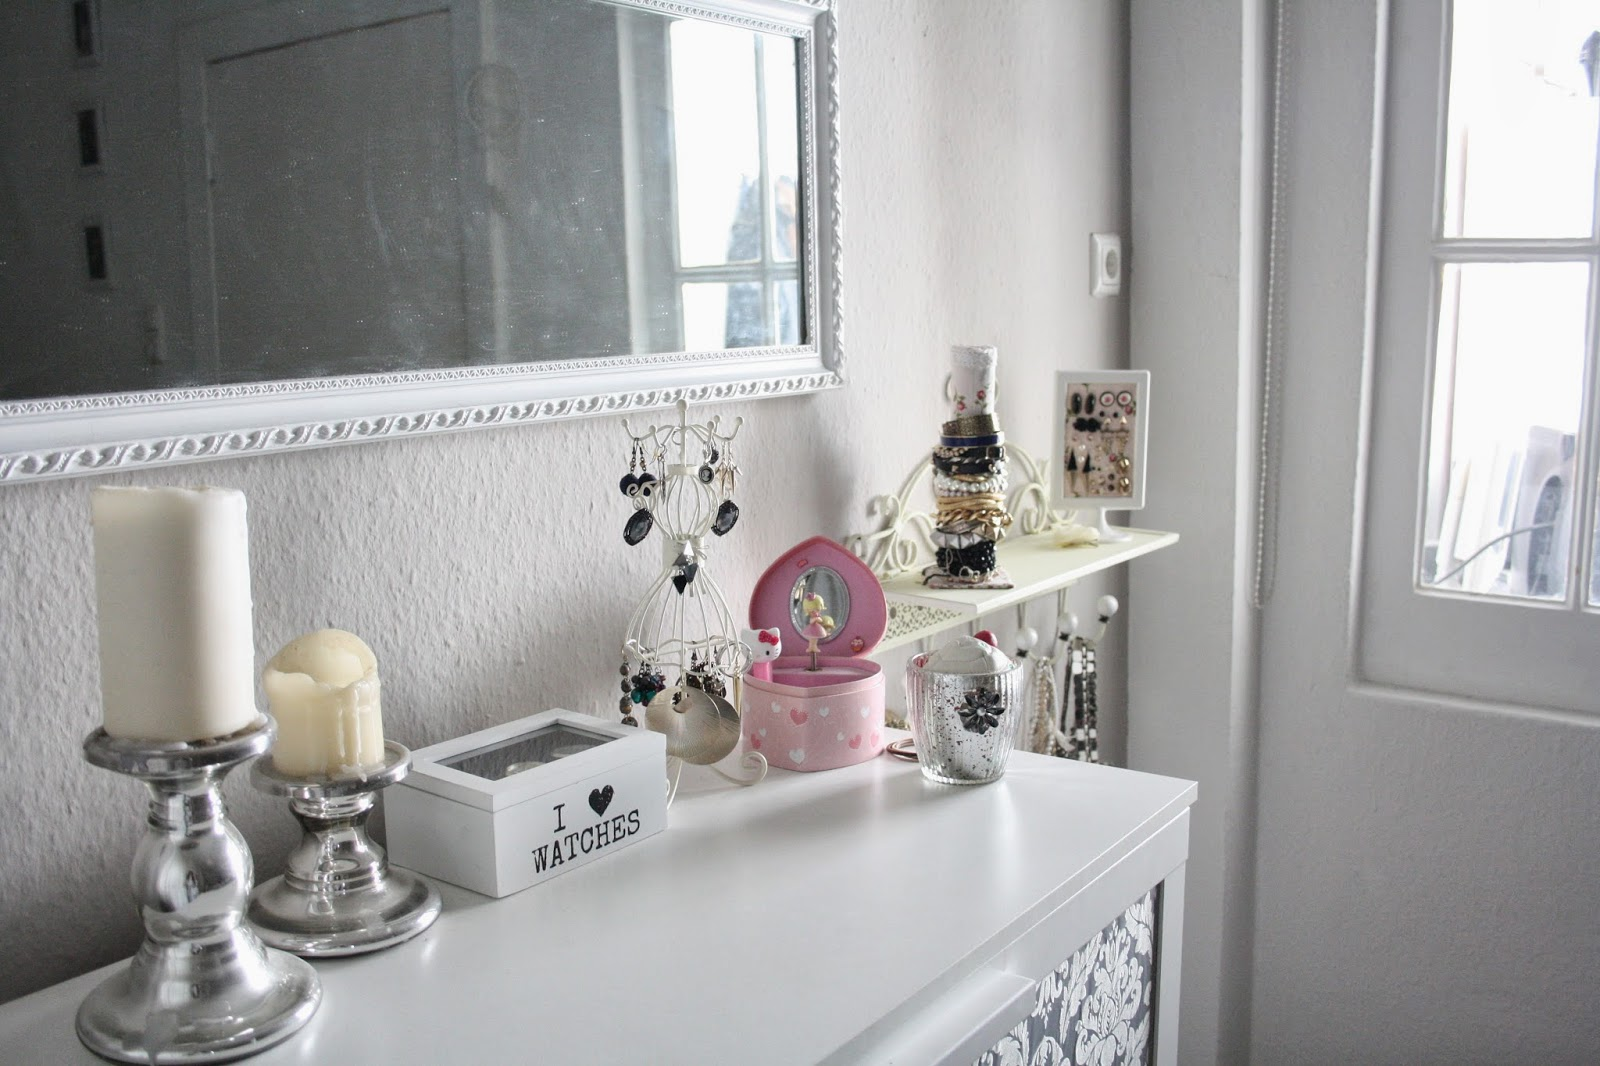 rain bows and fairytales schmuckaufbewahrung. Black Bedroom Furniture Sets. Home Design Ideas